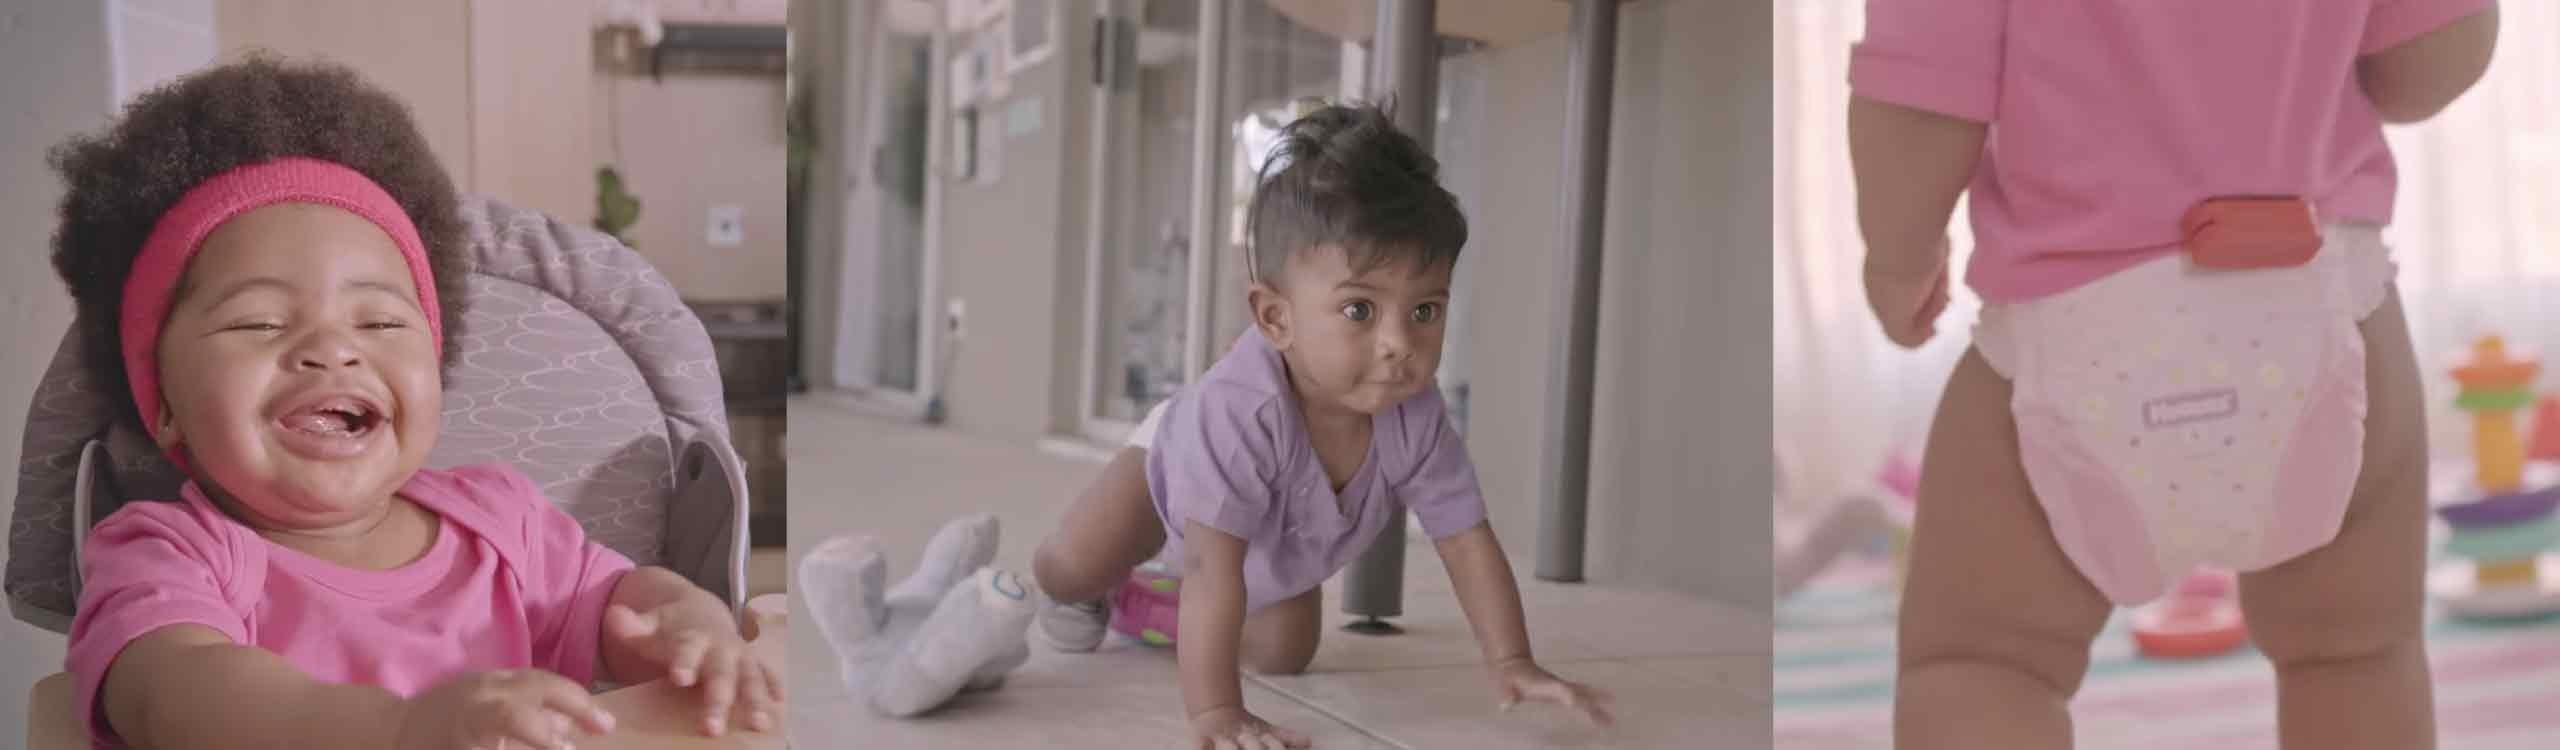 huggies primera maratón para bebés del mundo